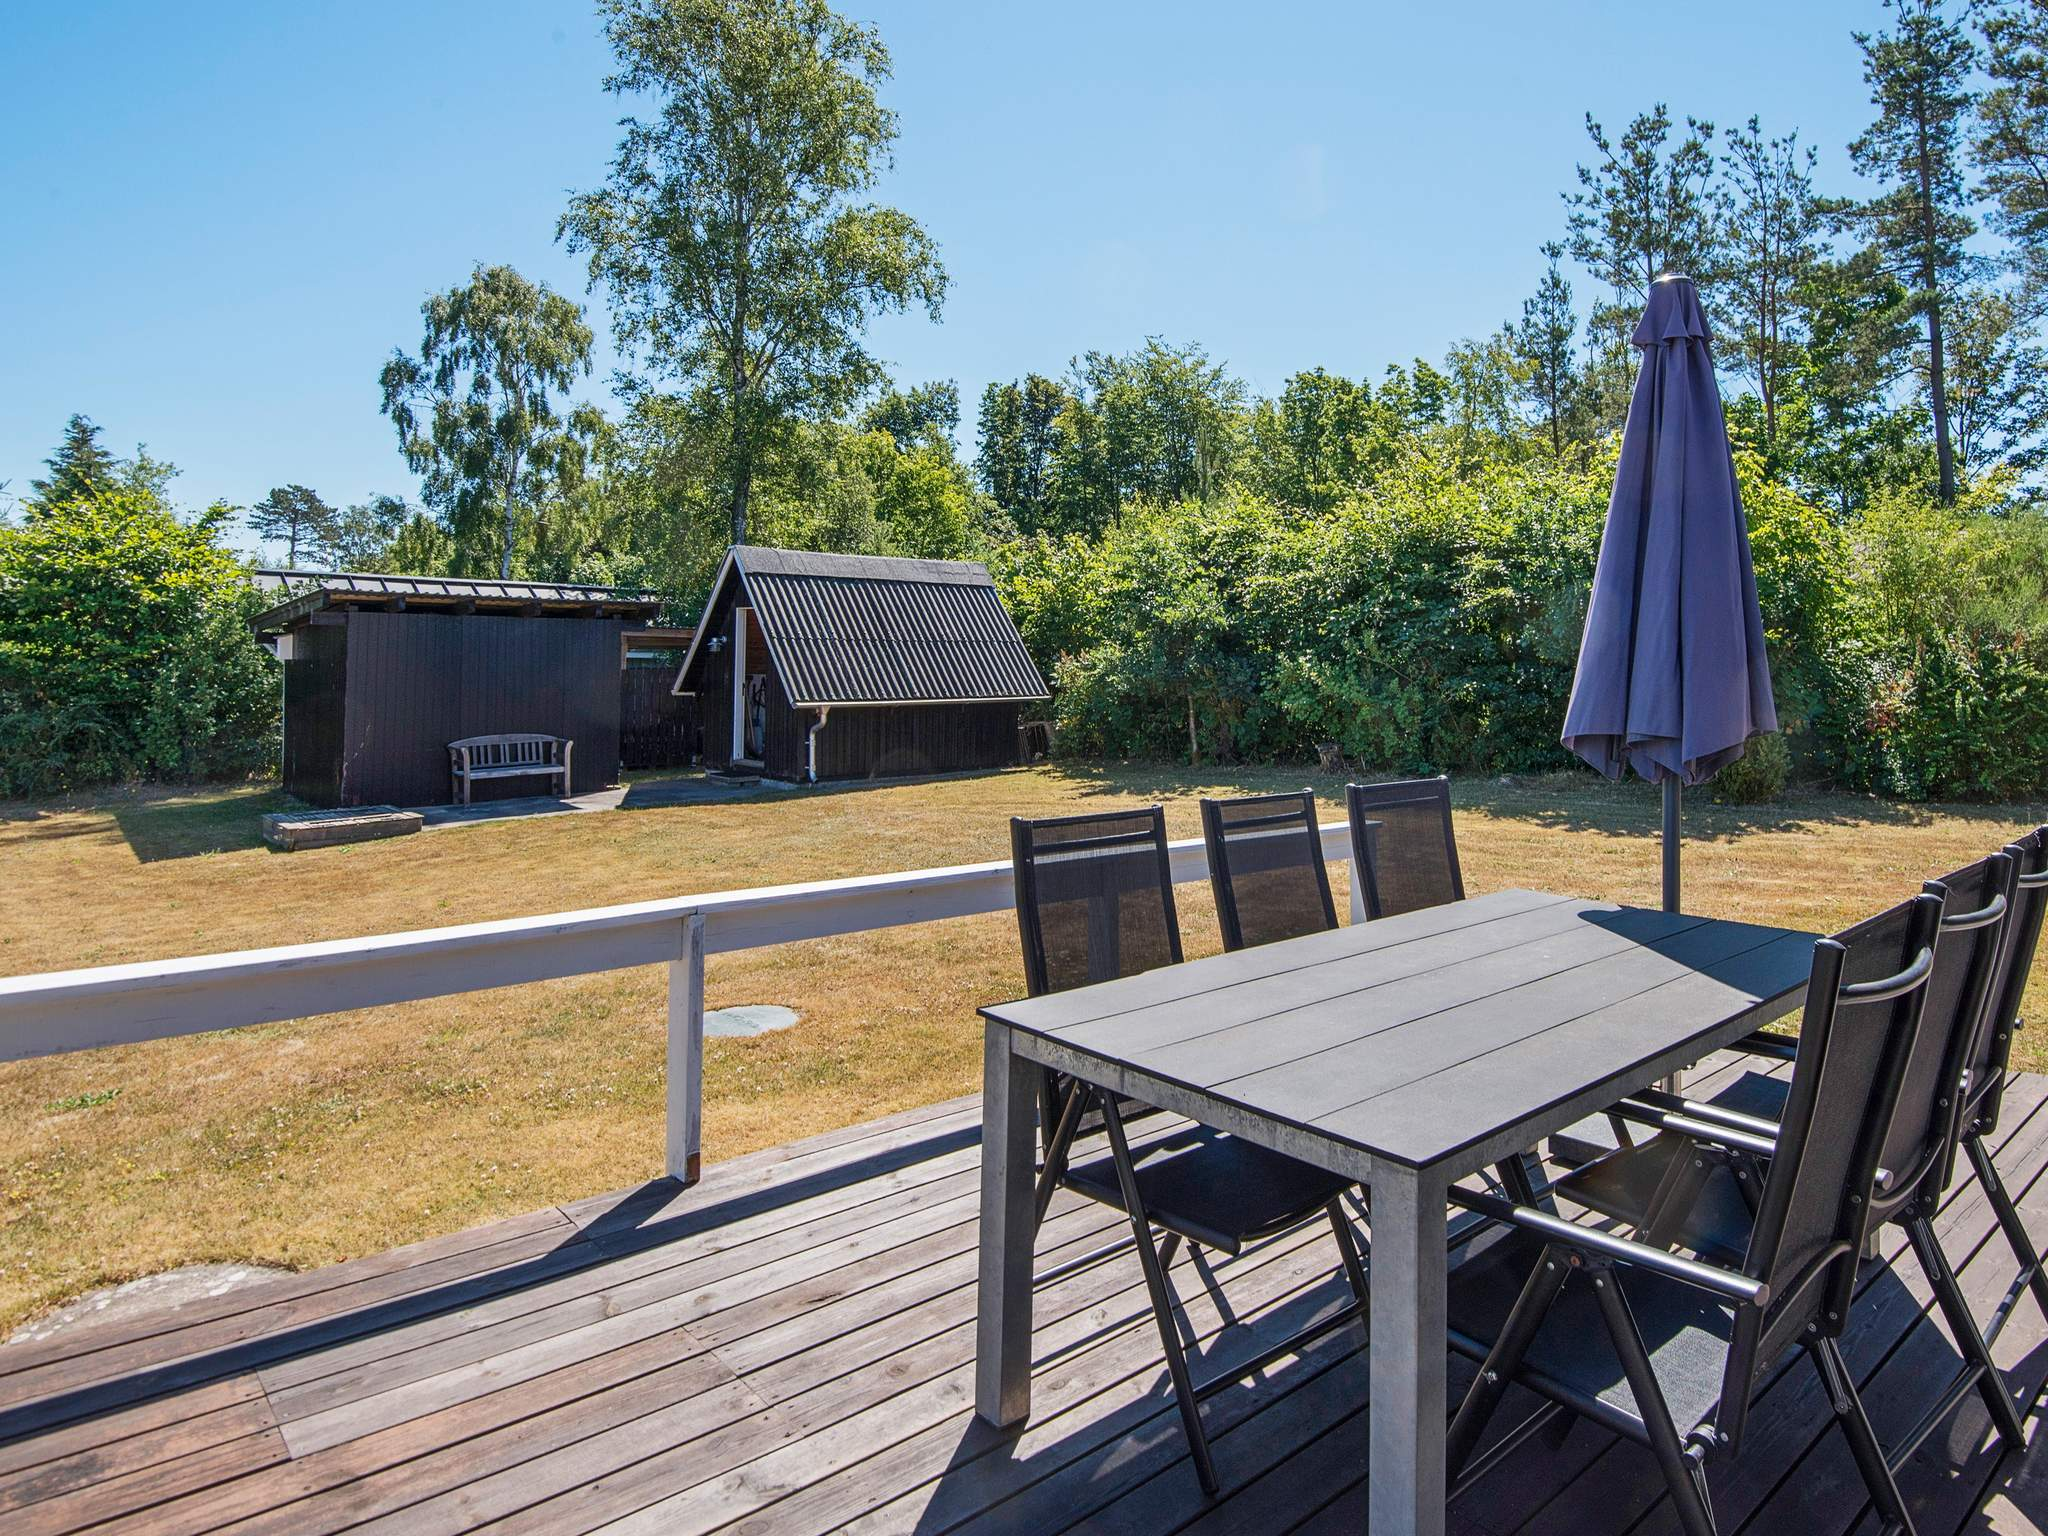 Maison de vacances Helgenæs (978615), Knebel, , Mer Baltique danoise, Danemark, image 18